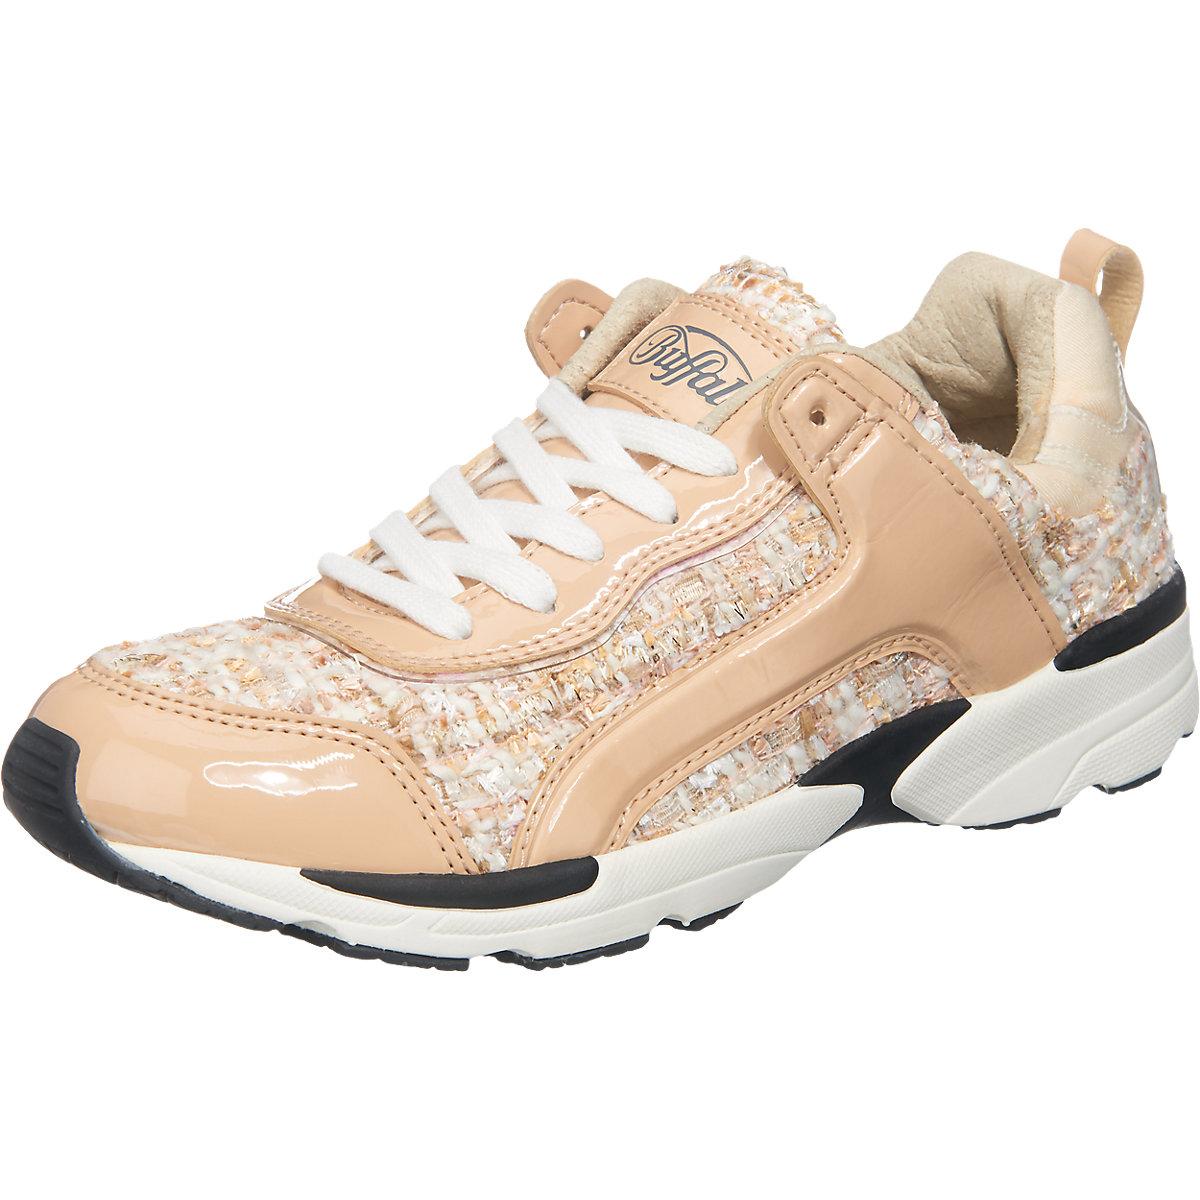 BUFFALO, BUFFALO Sneakers, beige   mirapodo